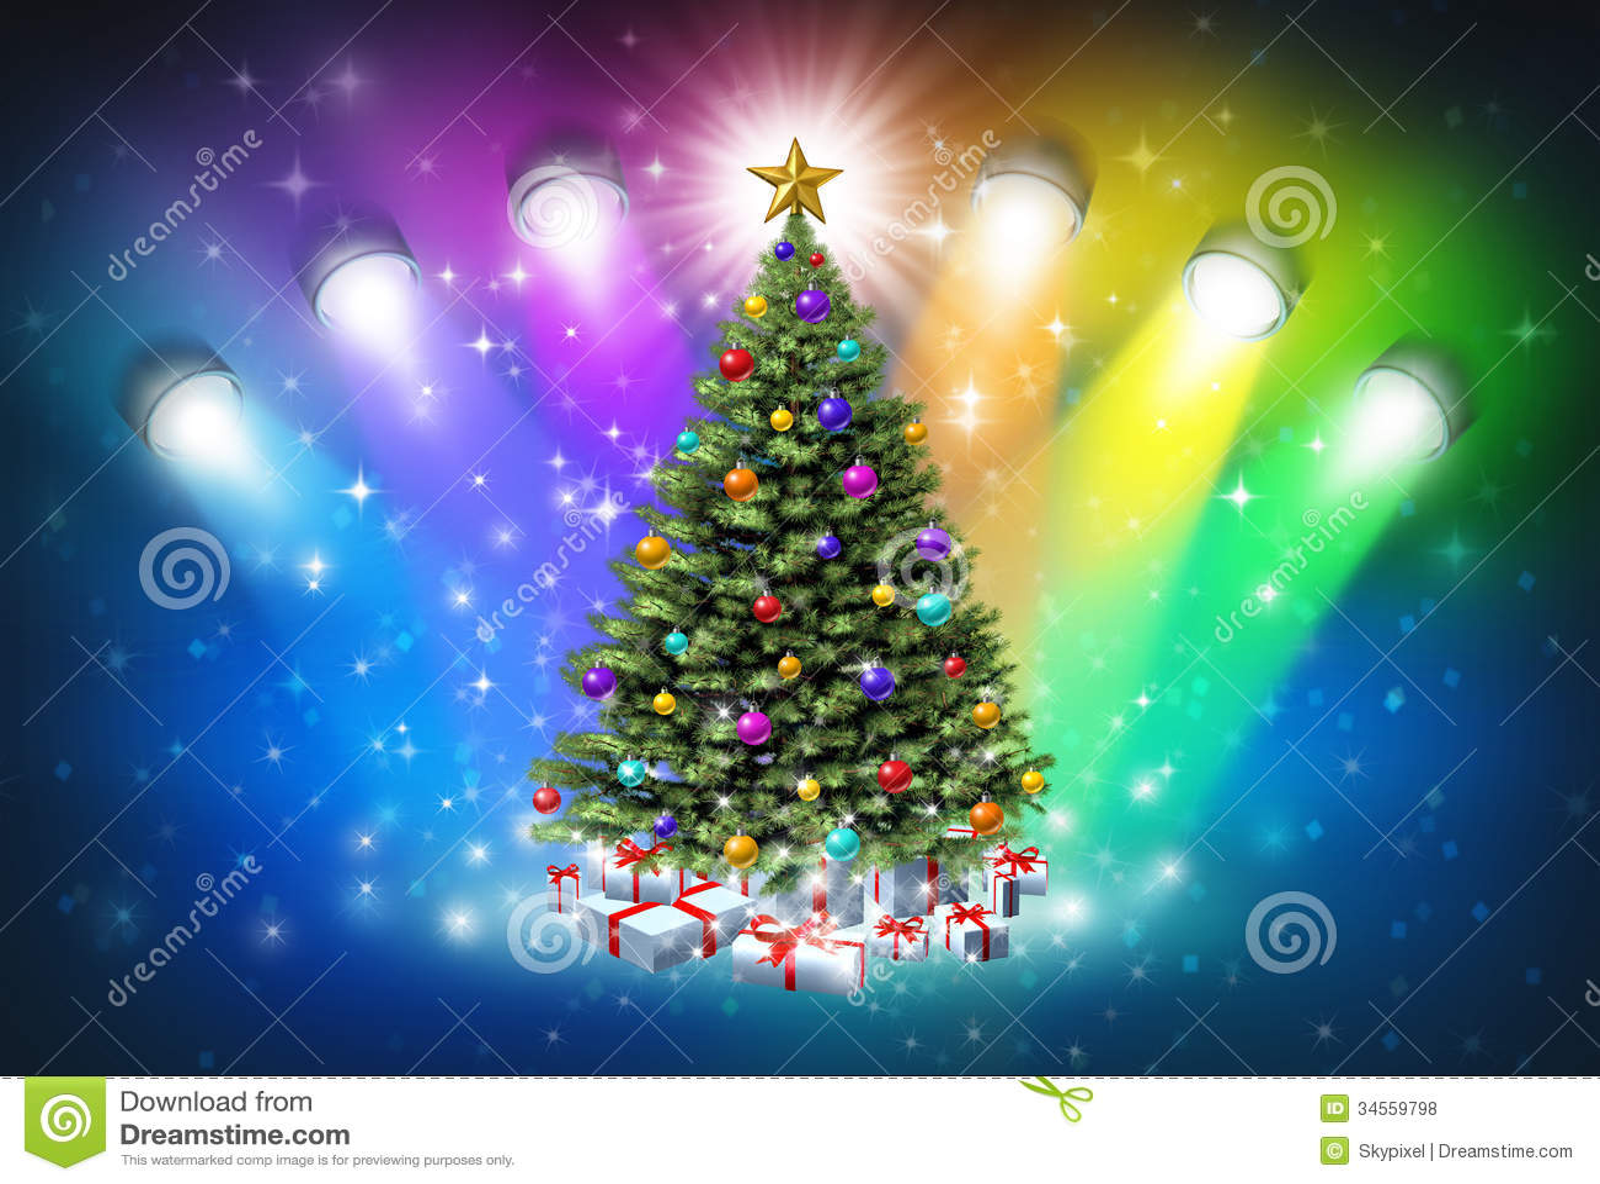 Led Christmas Tree Light Laser Christmas Lightsoutdoor Laser Spot